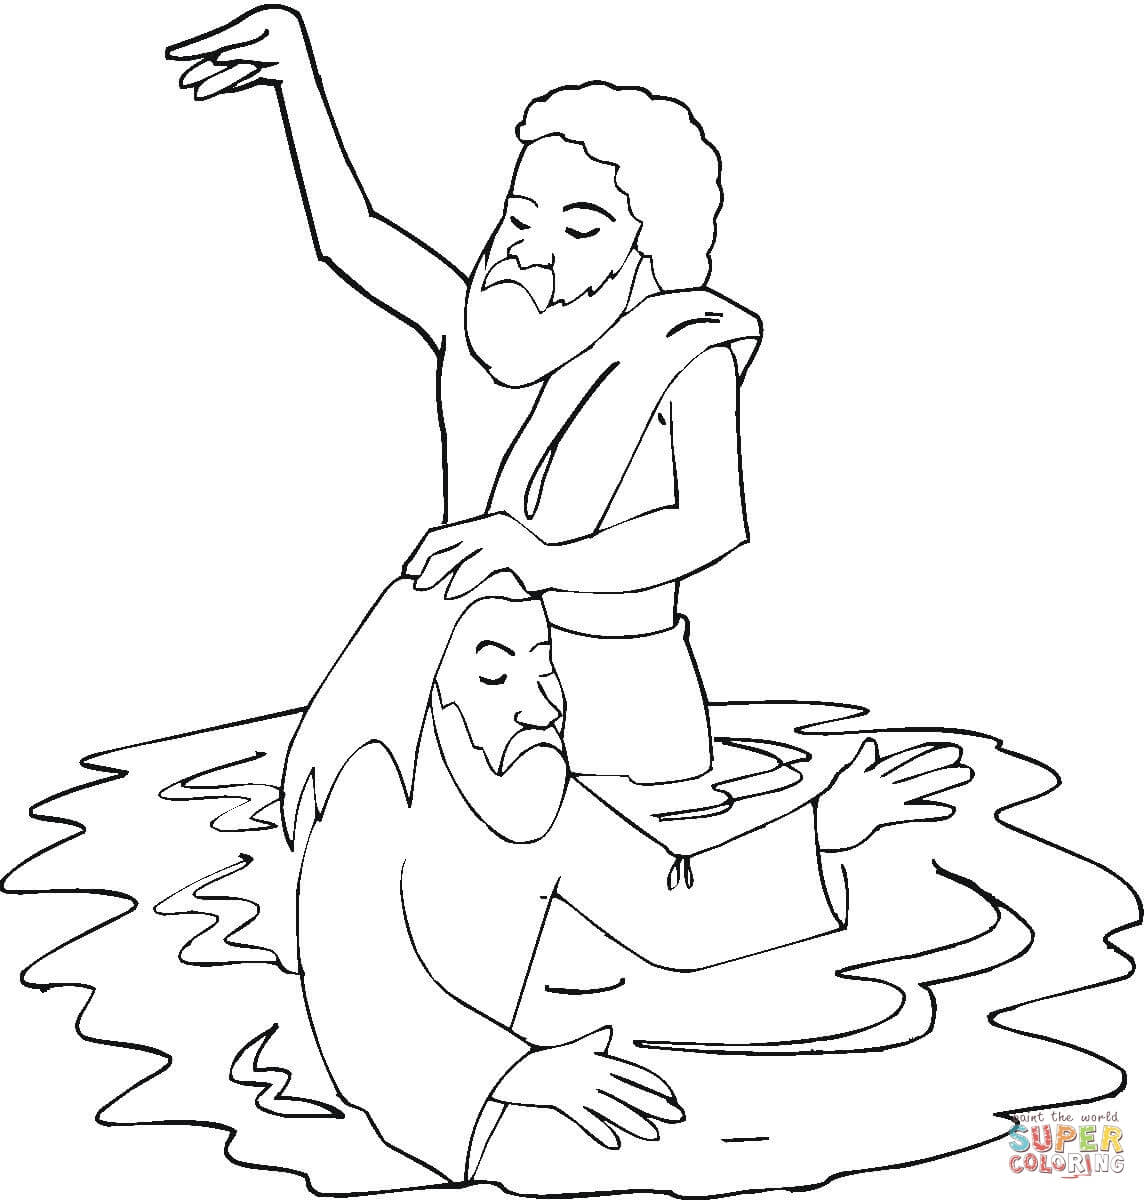 Coloring pages for jordans - Jesus Baptism Jordan Shoes Coloring Pages John The Baptist